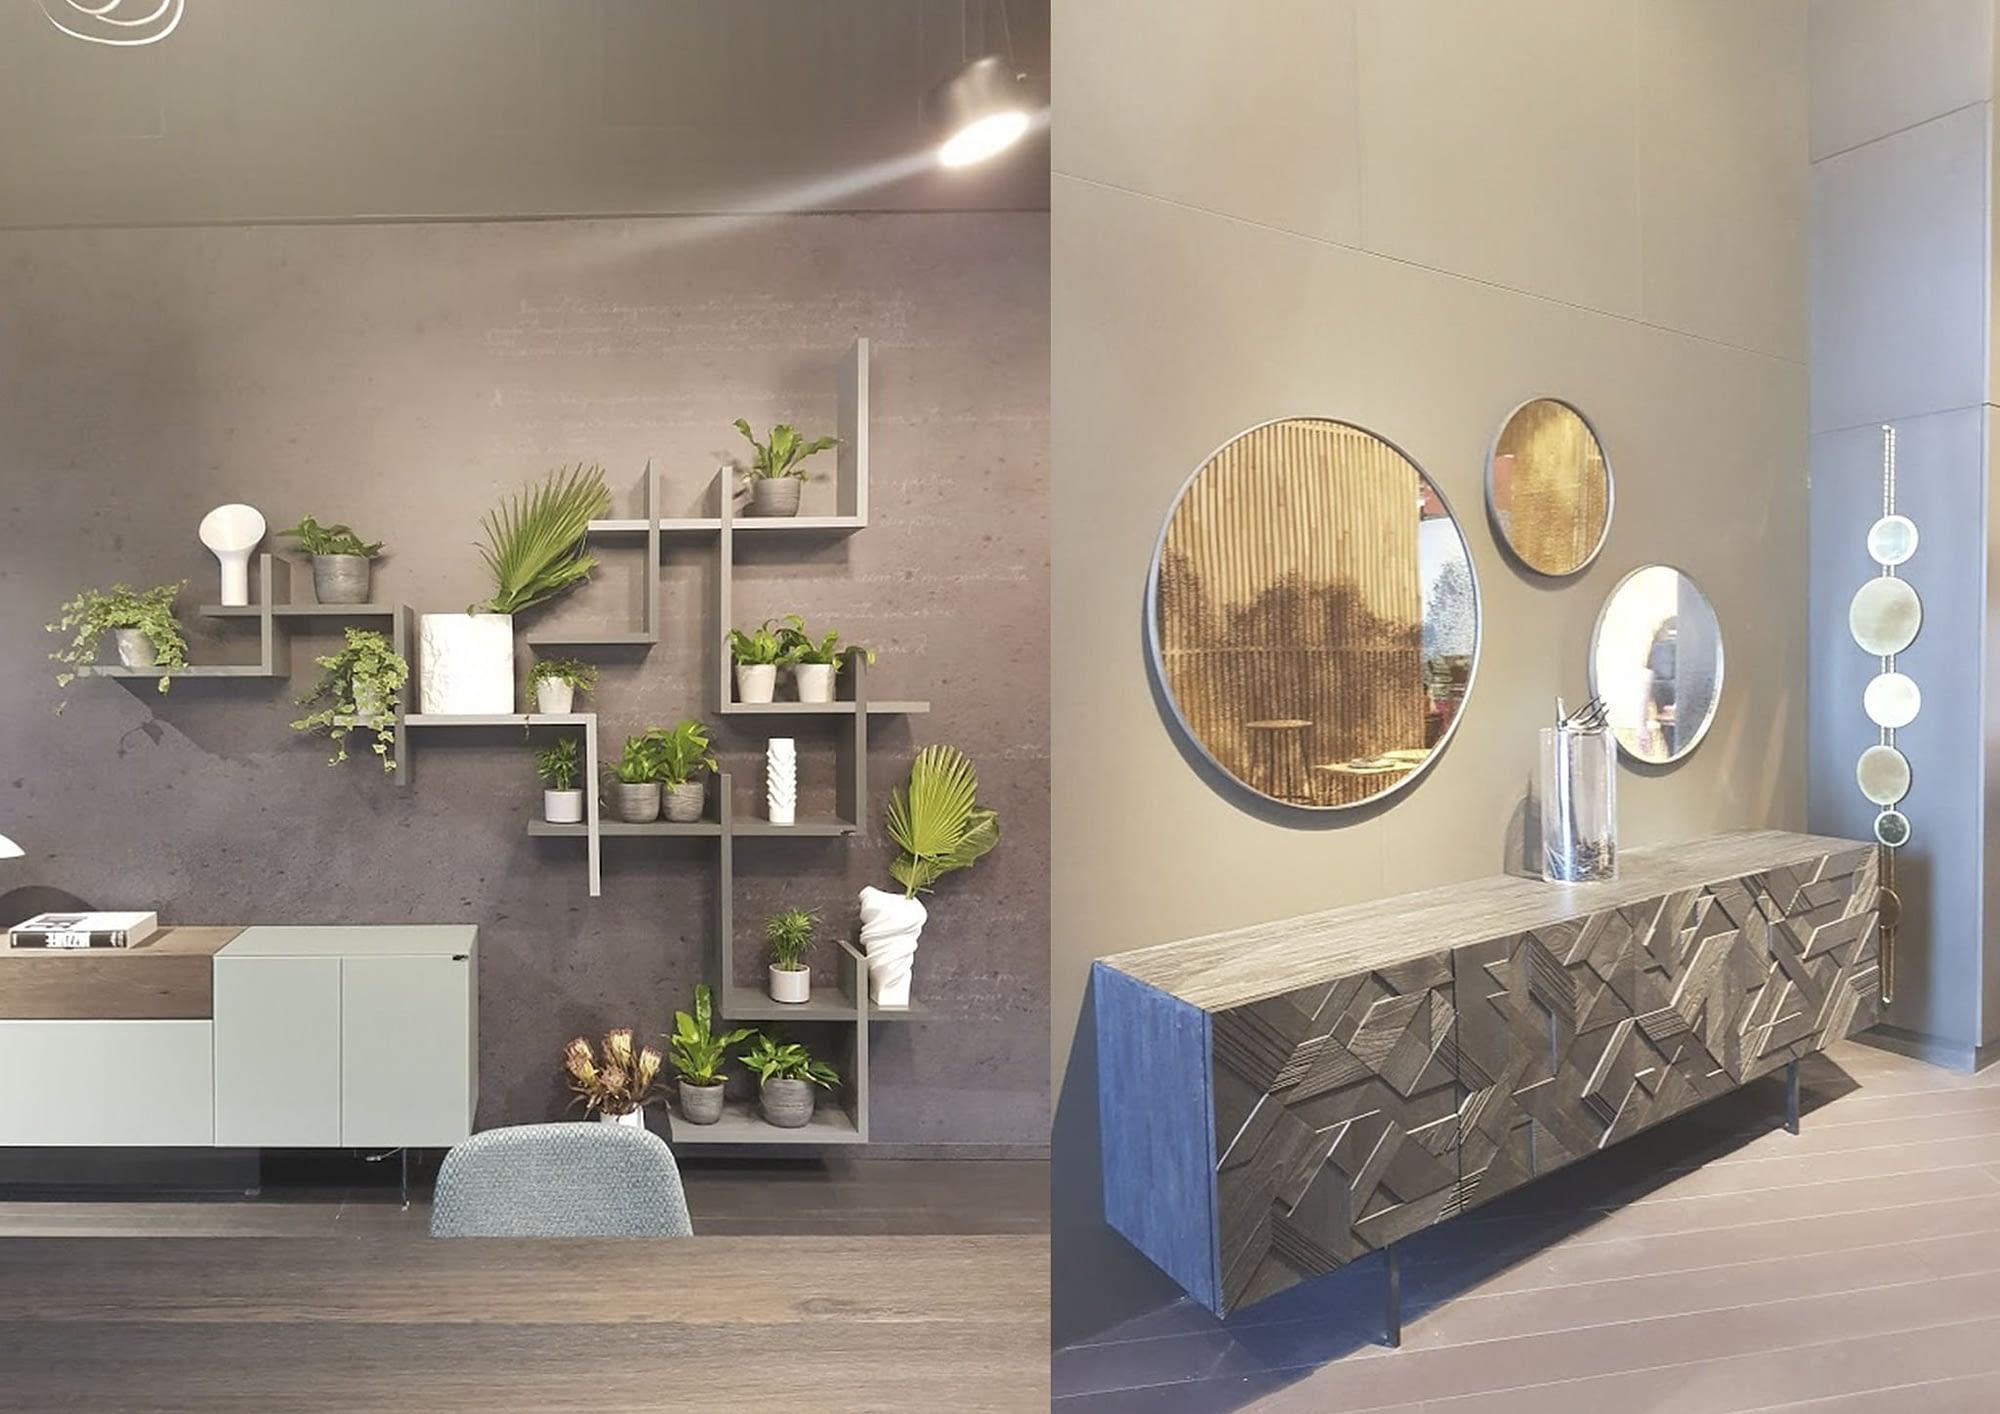 Milano Design Week 2018 - Salone del Mobile 98